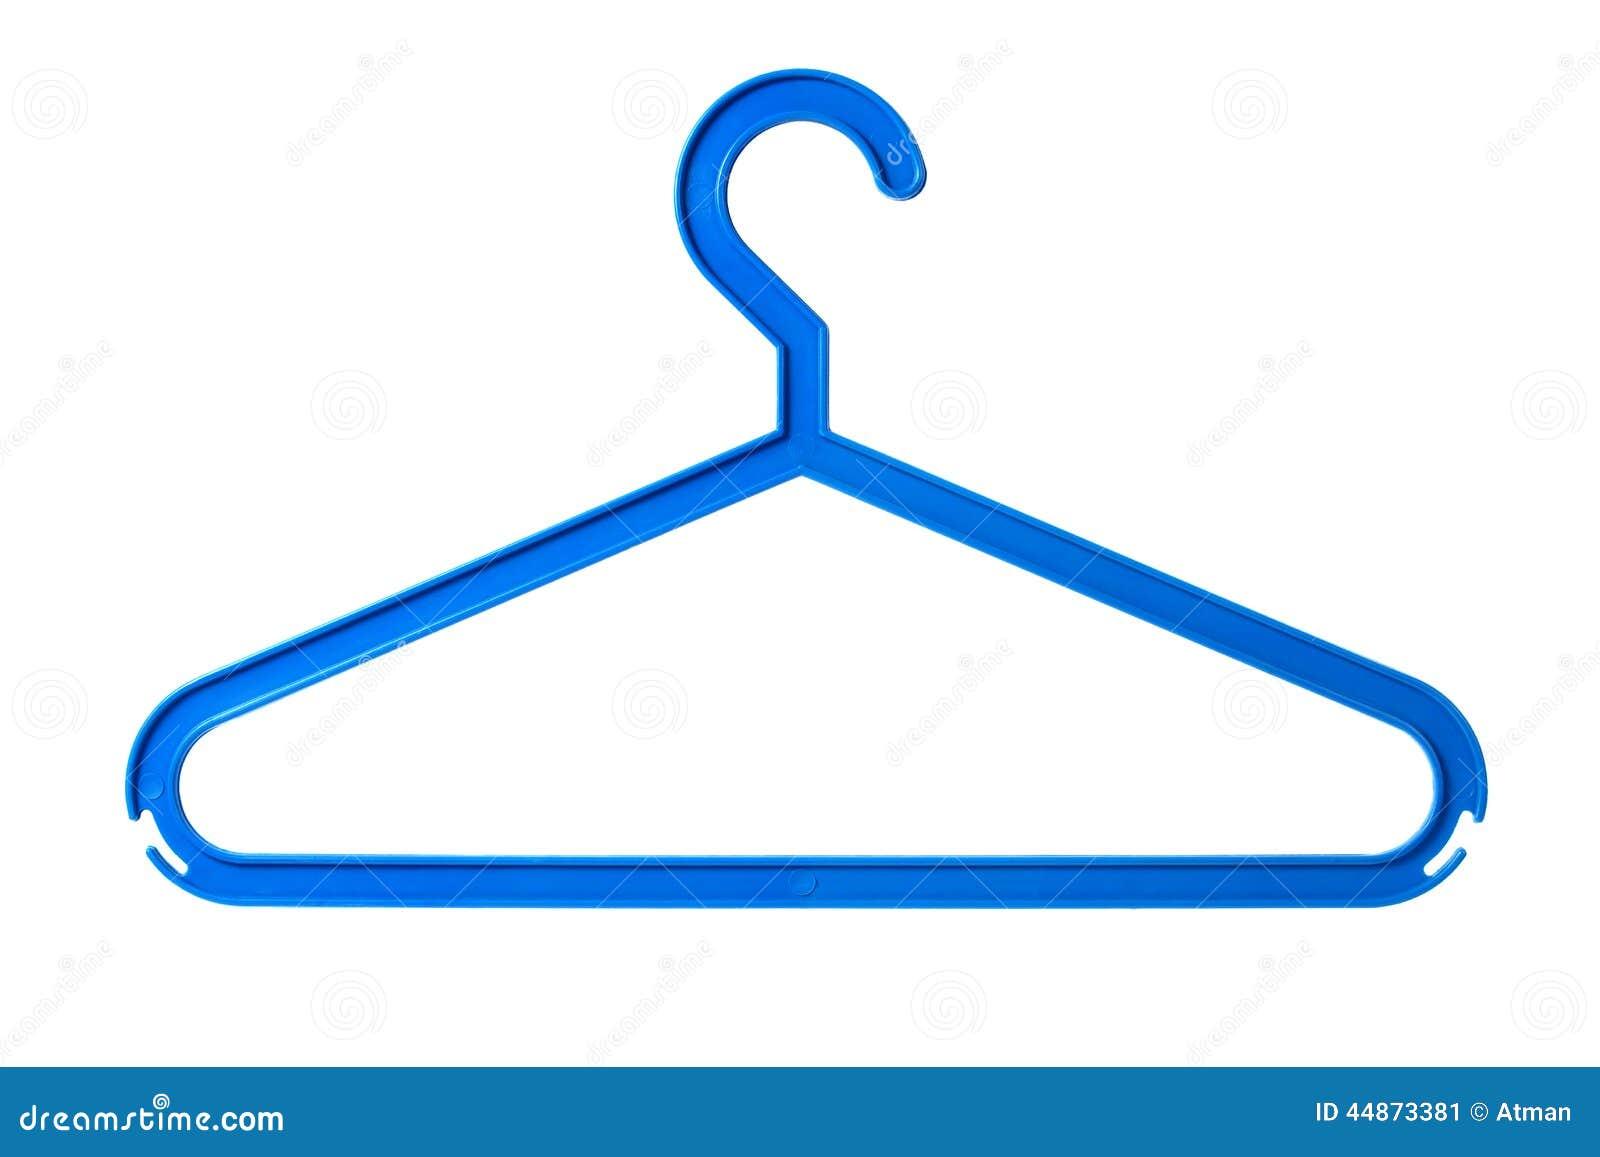 Design Your Kitchen Plastic Hanger Stock Photo Image 44873381